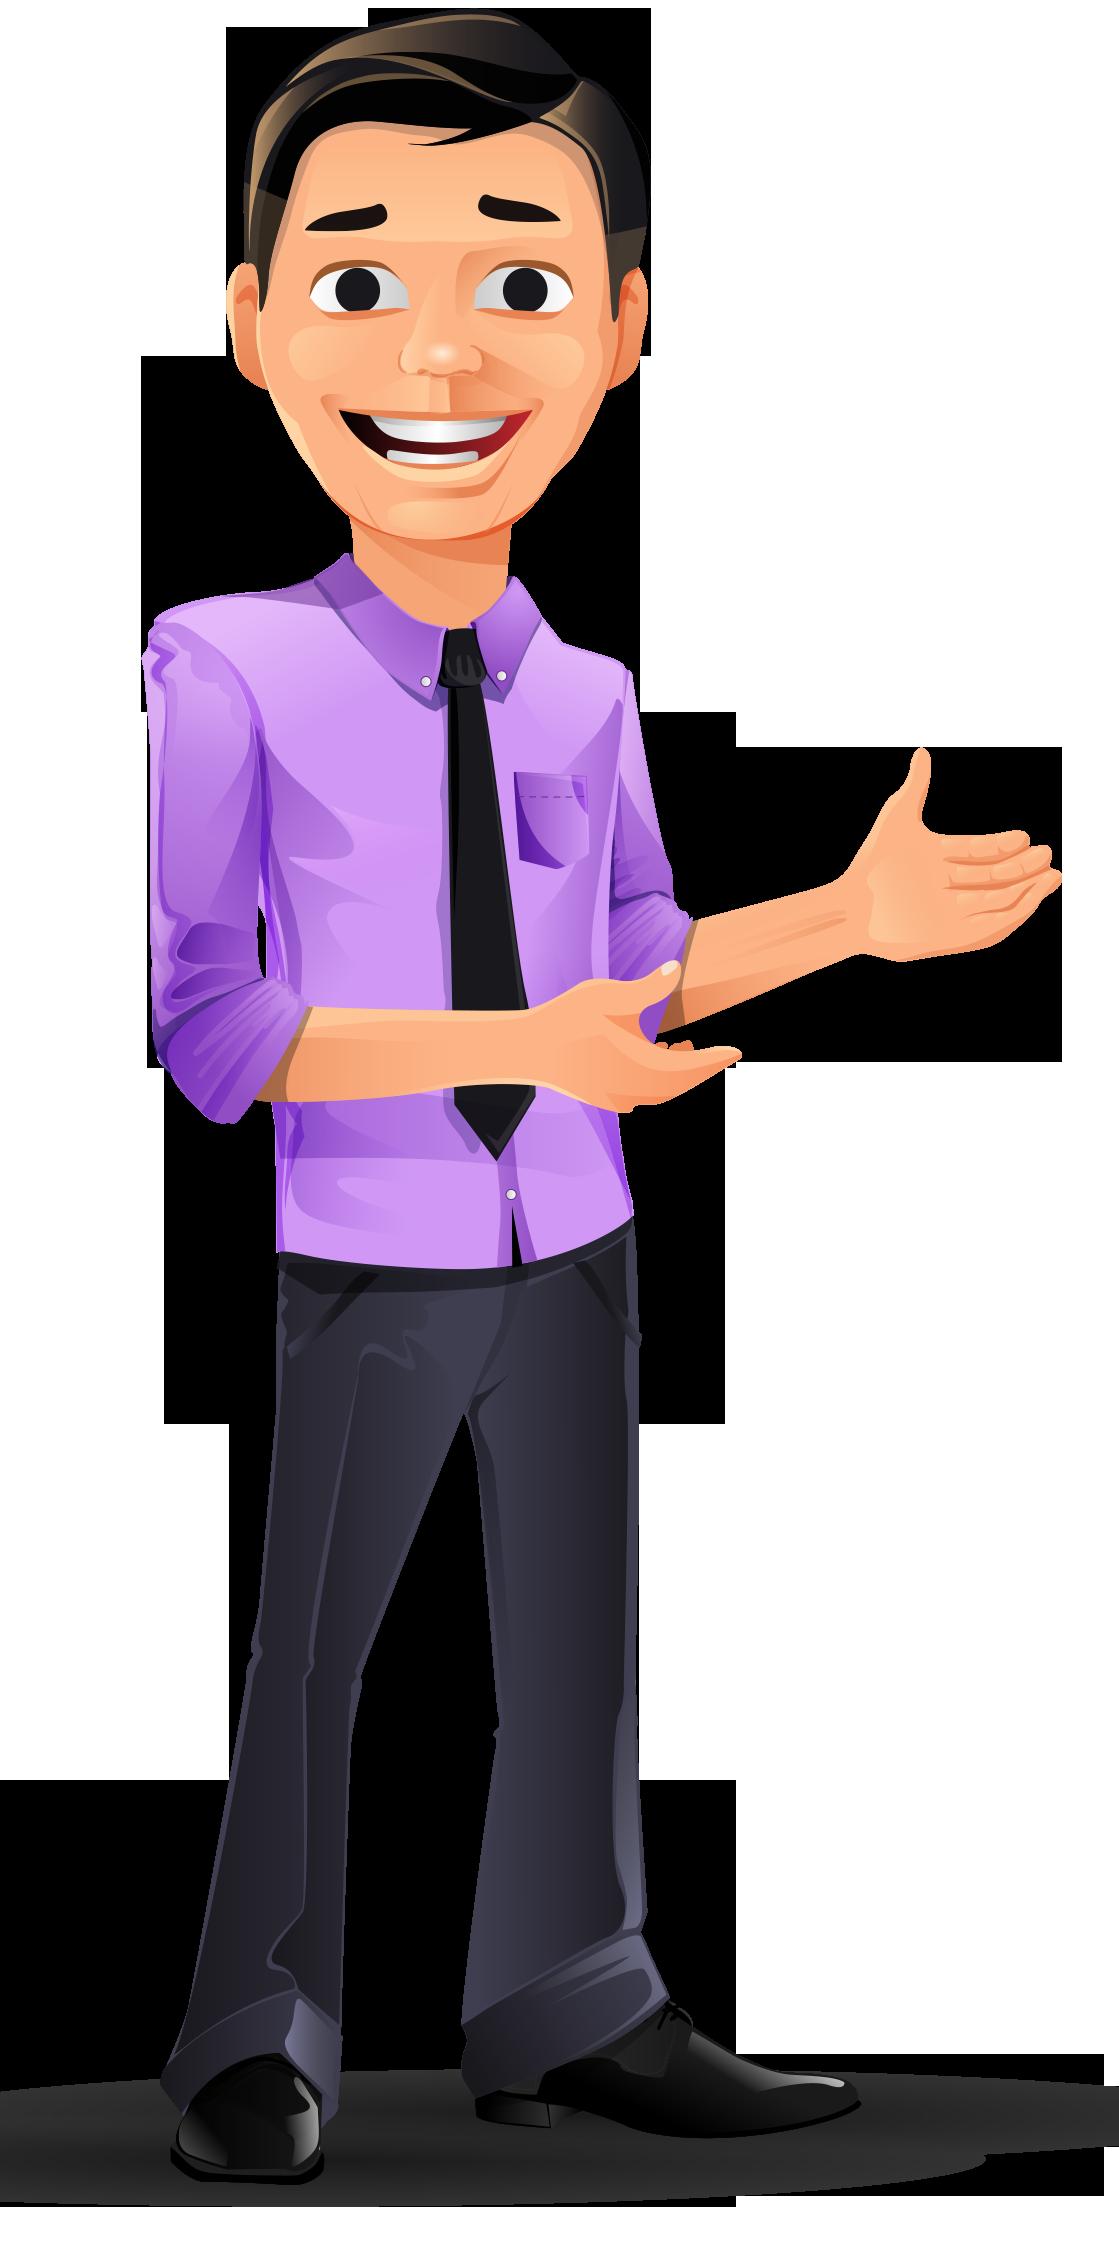 Young Businessman Vector Character Mascotes Desenho A Lapis Anime